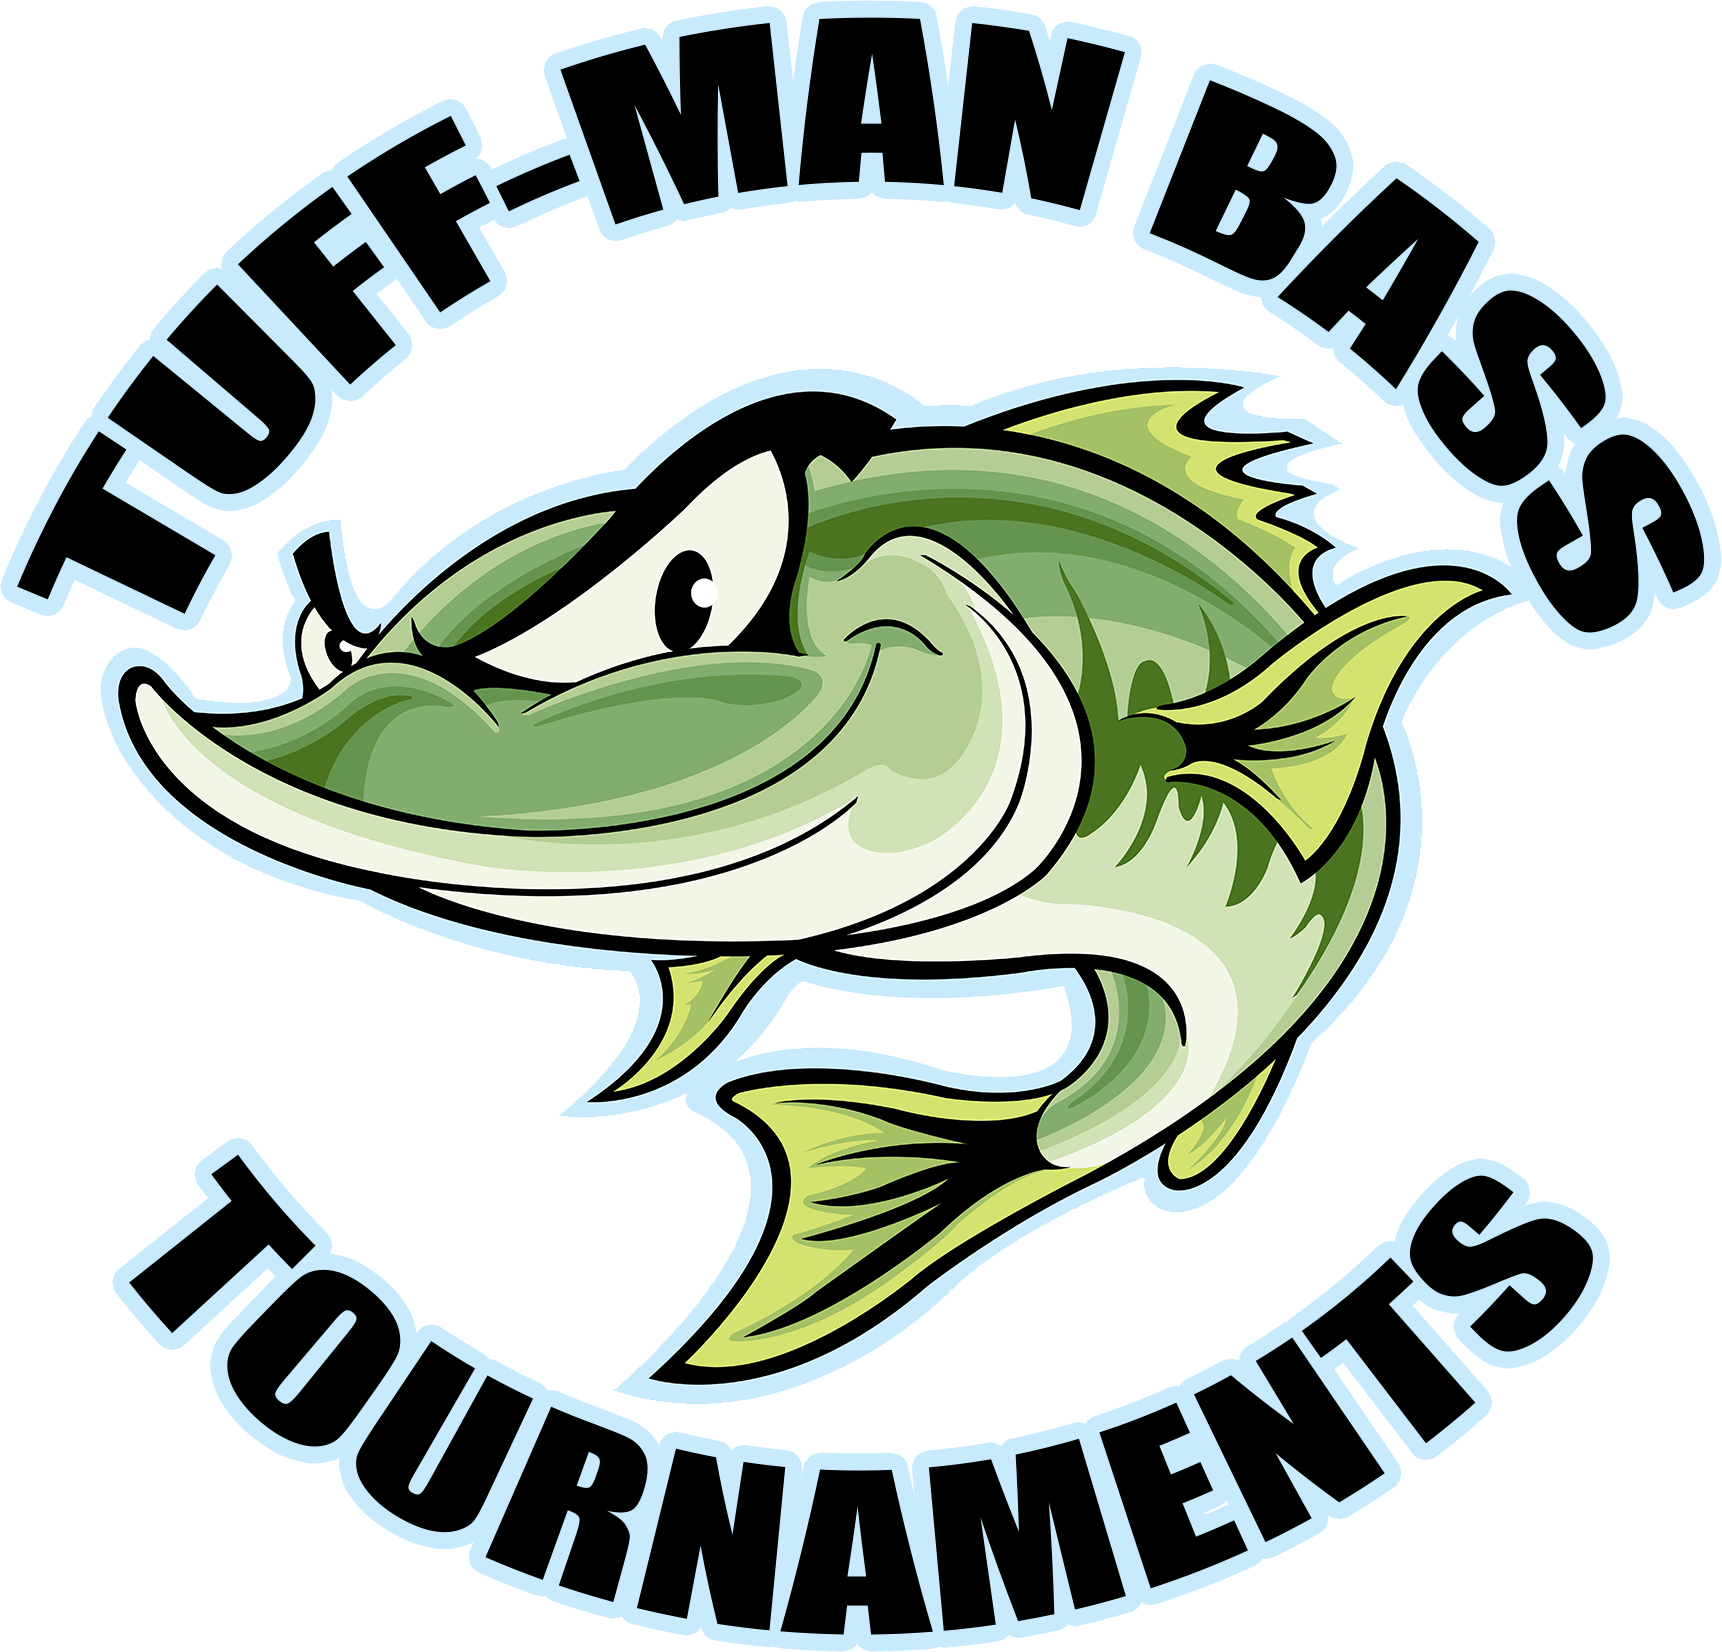 tournament tour tuff. Bass clipart fishing derby